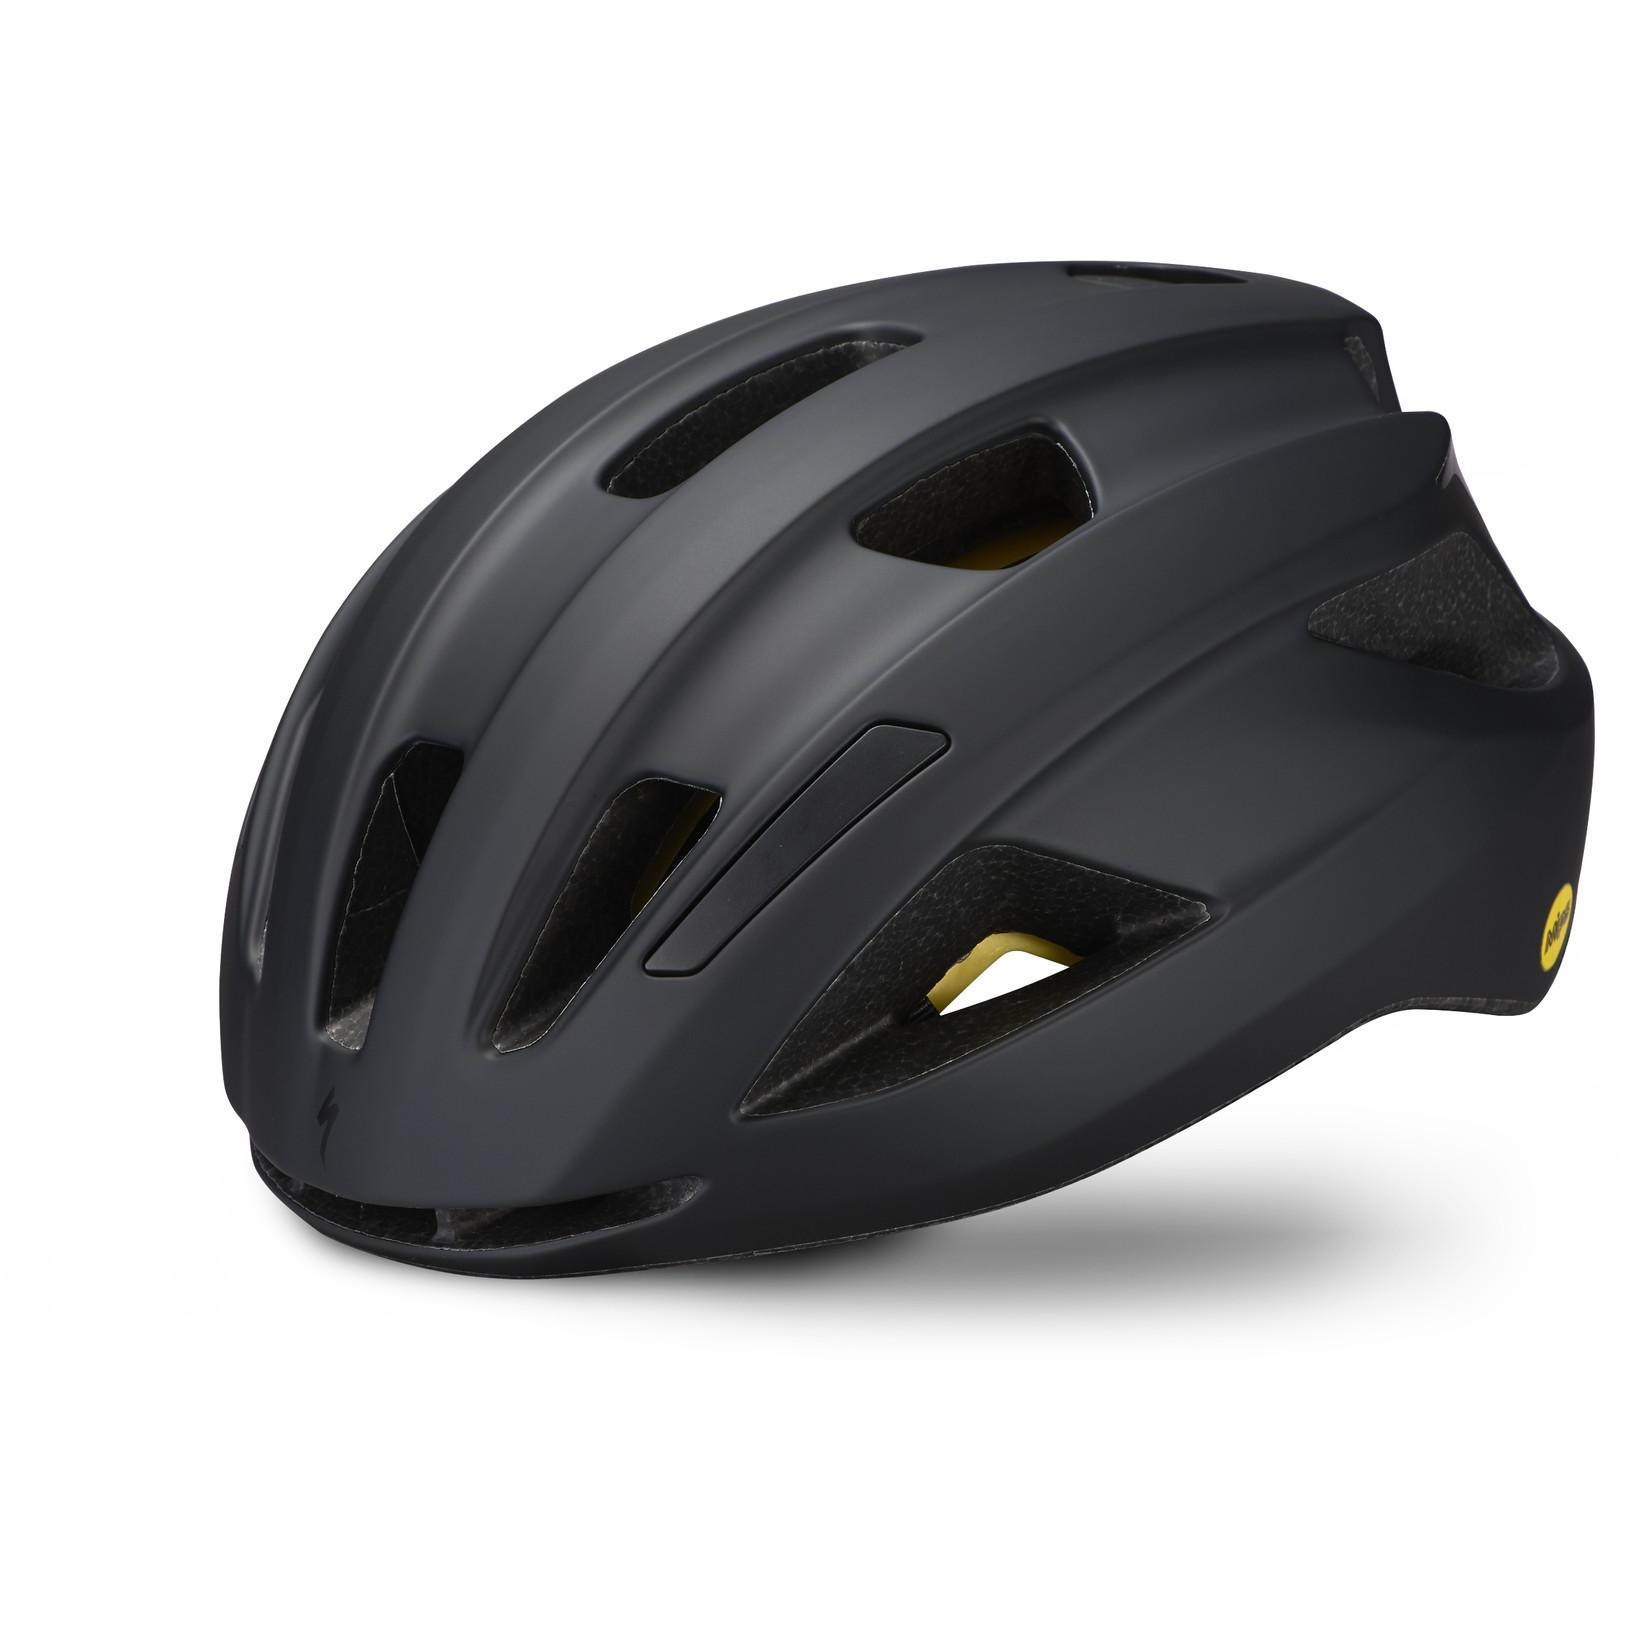 Specialized Specialized Align II Helmet, Black, M/L